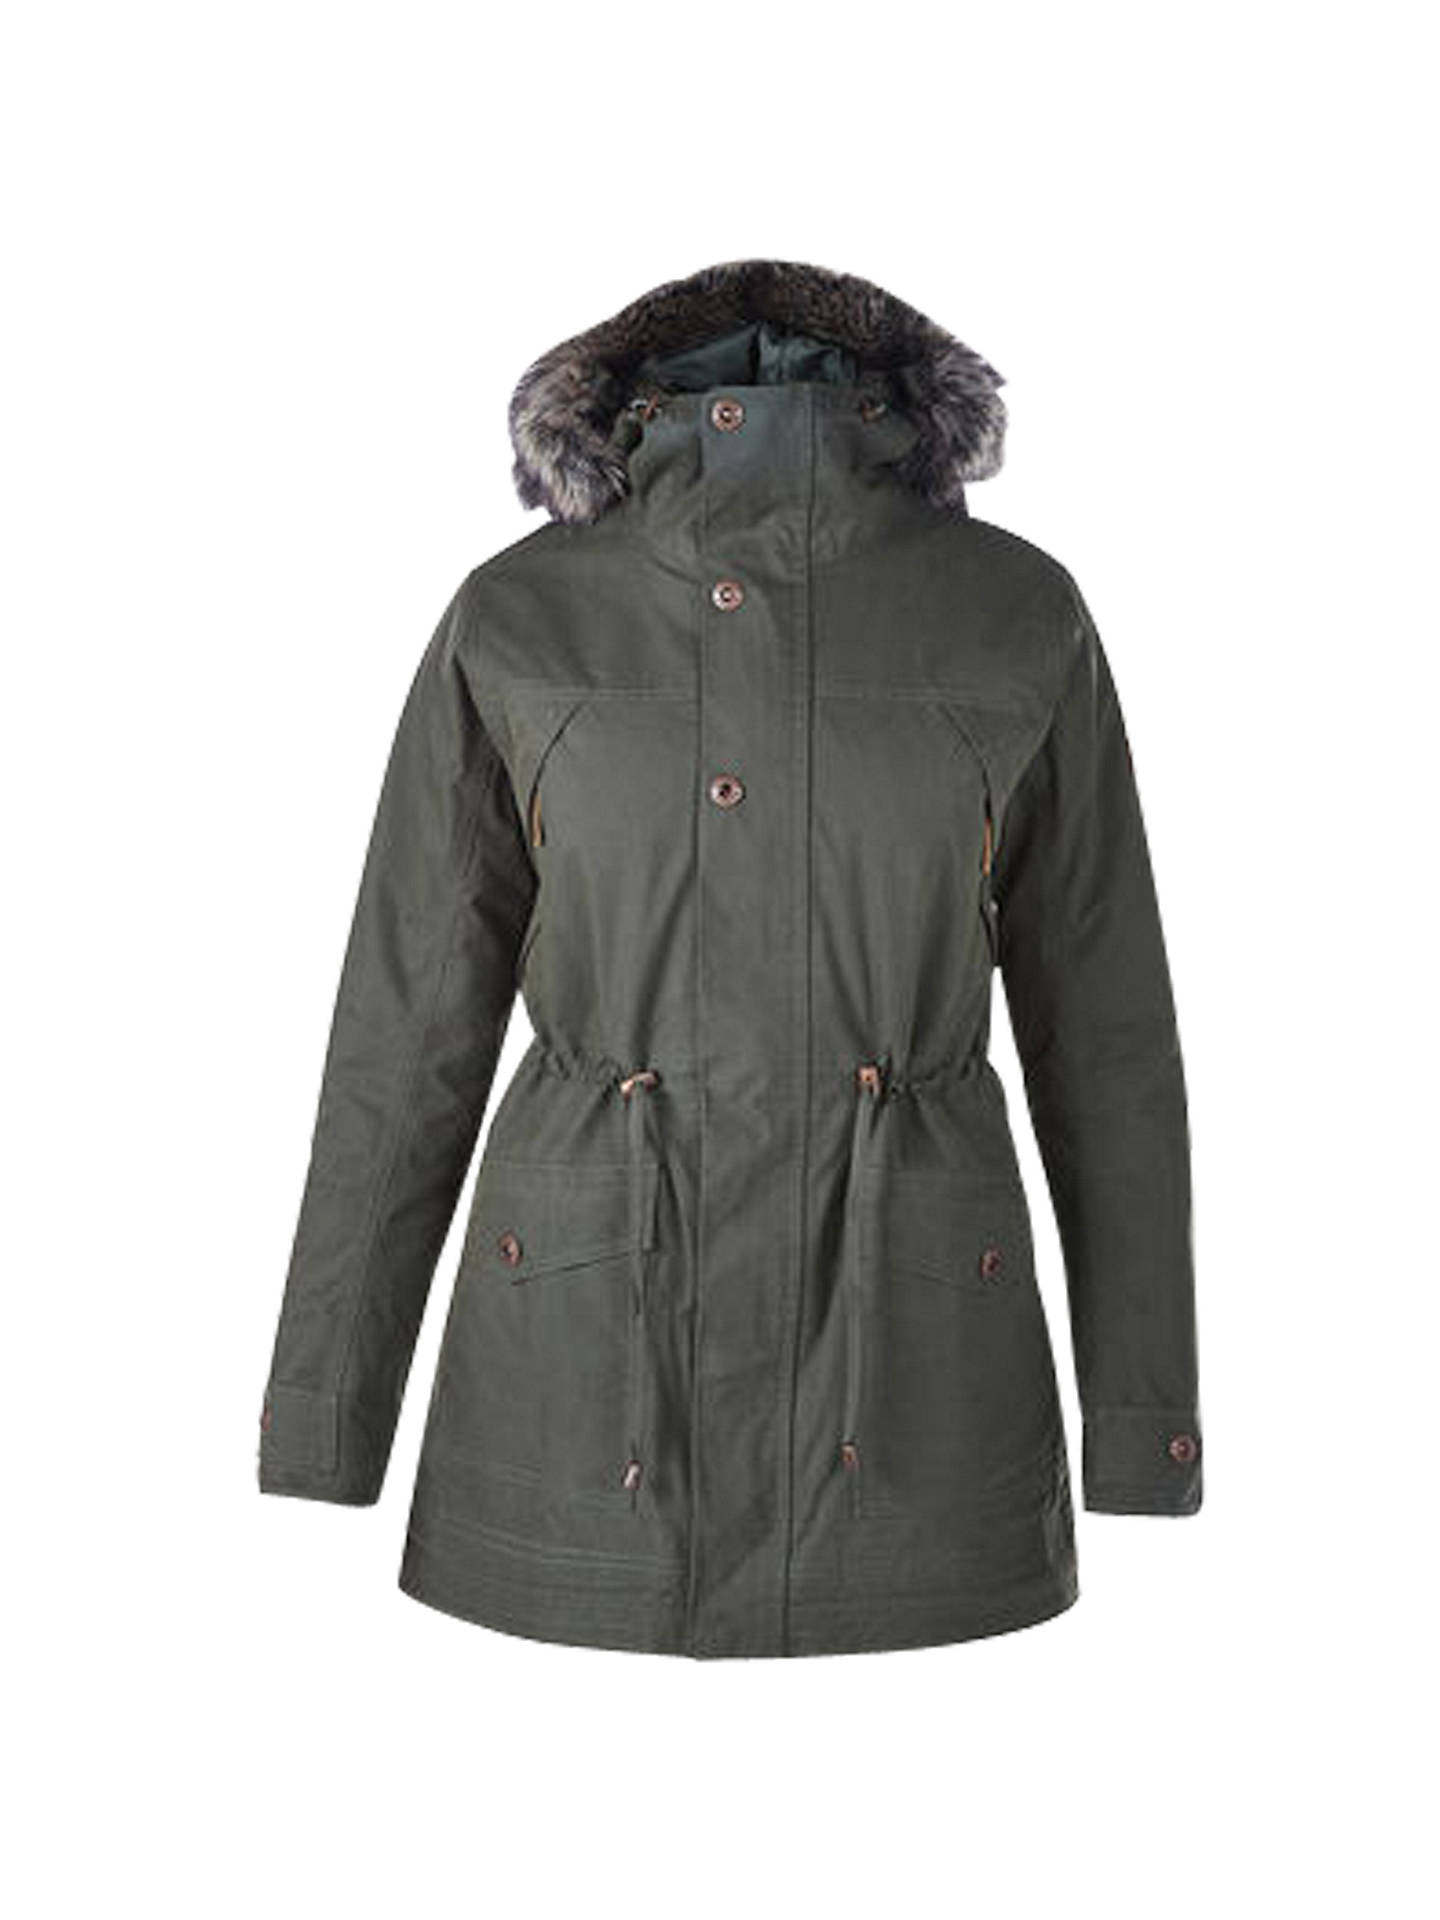 65b0f92c5 Berghaus Ancroft Waterproof Women's Parka Jacket, Green at John ...